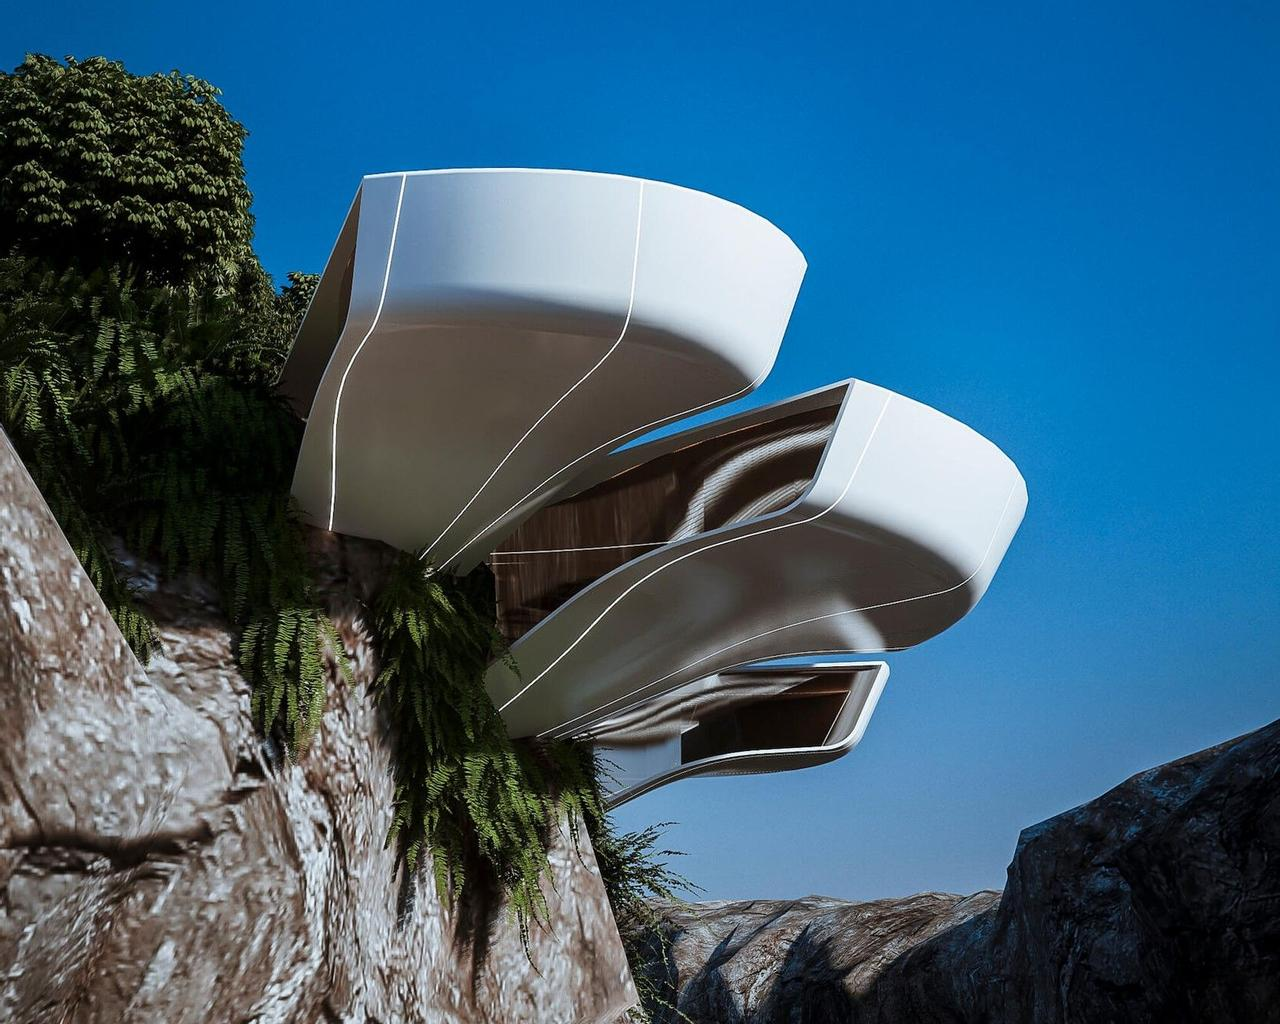 Футуристический дом-цветок Nelumbo, расцвел среди скал